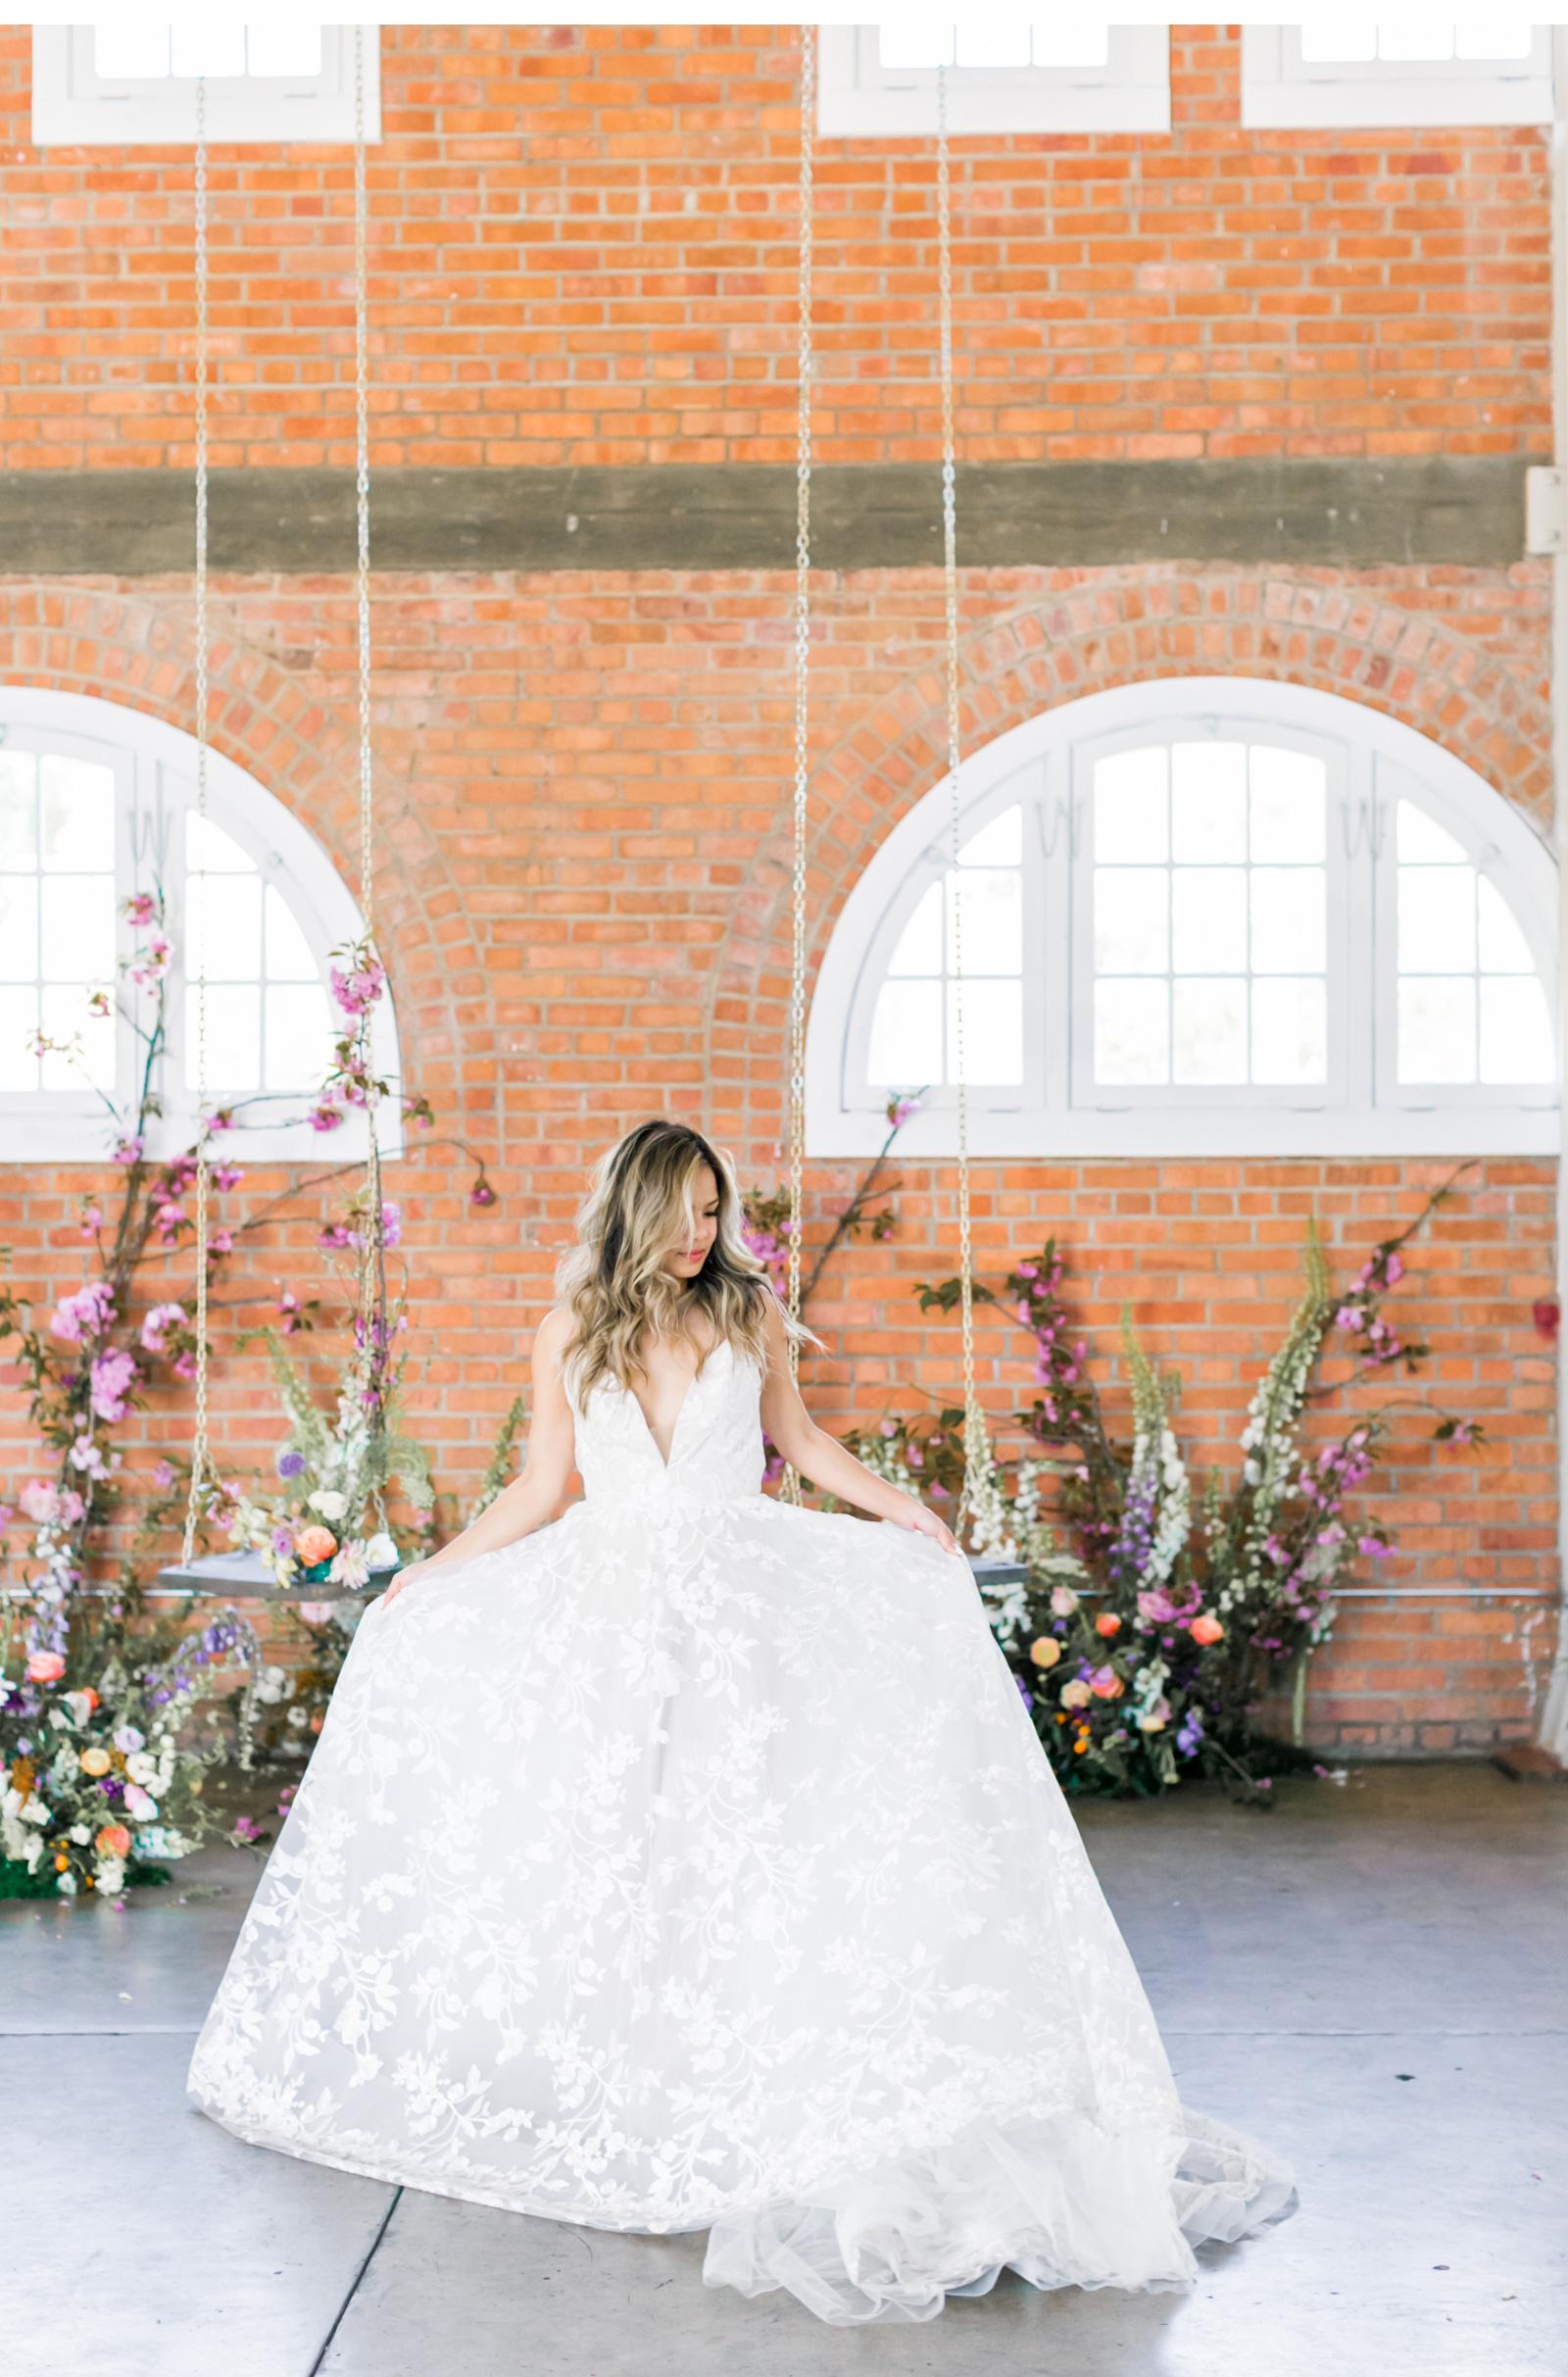 Malibu-Weddings-Natalie-Schutt-Photography-Inspired-by-This_06.jpg